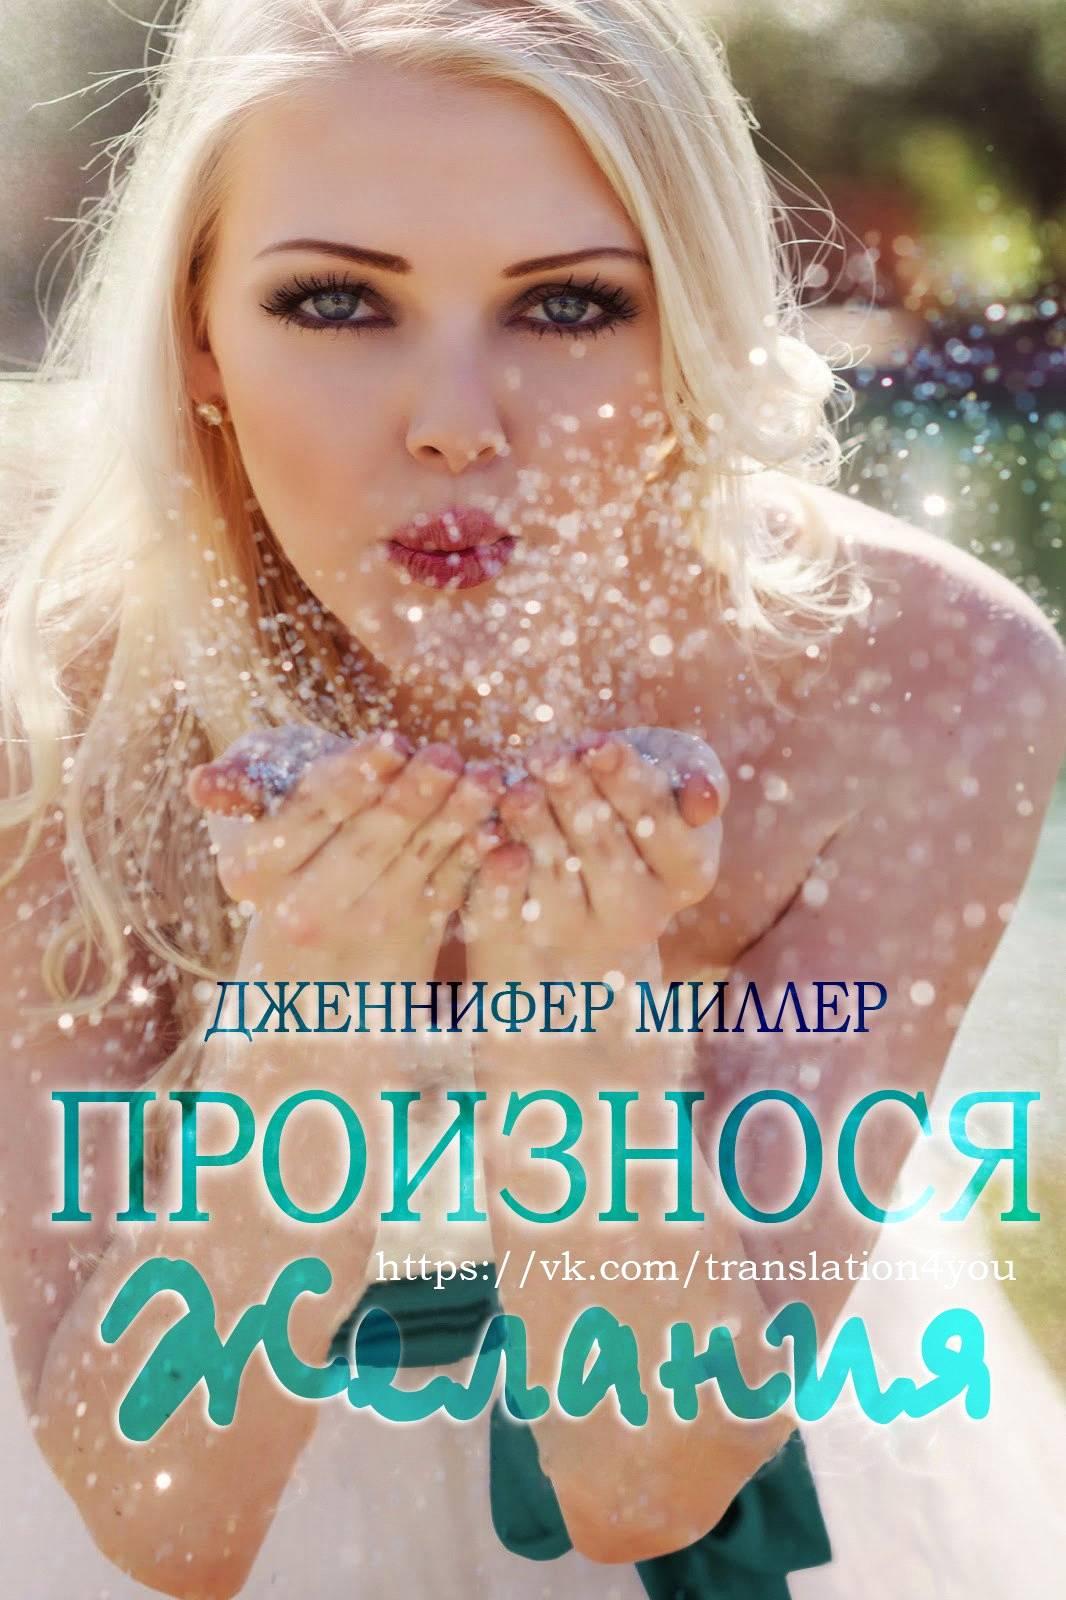 na-devichnike-vi-delali-minet-zhenskiy-forum-sperma-v-vagine-nechayanno